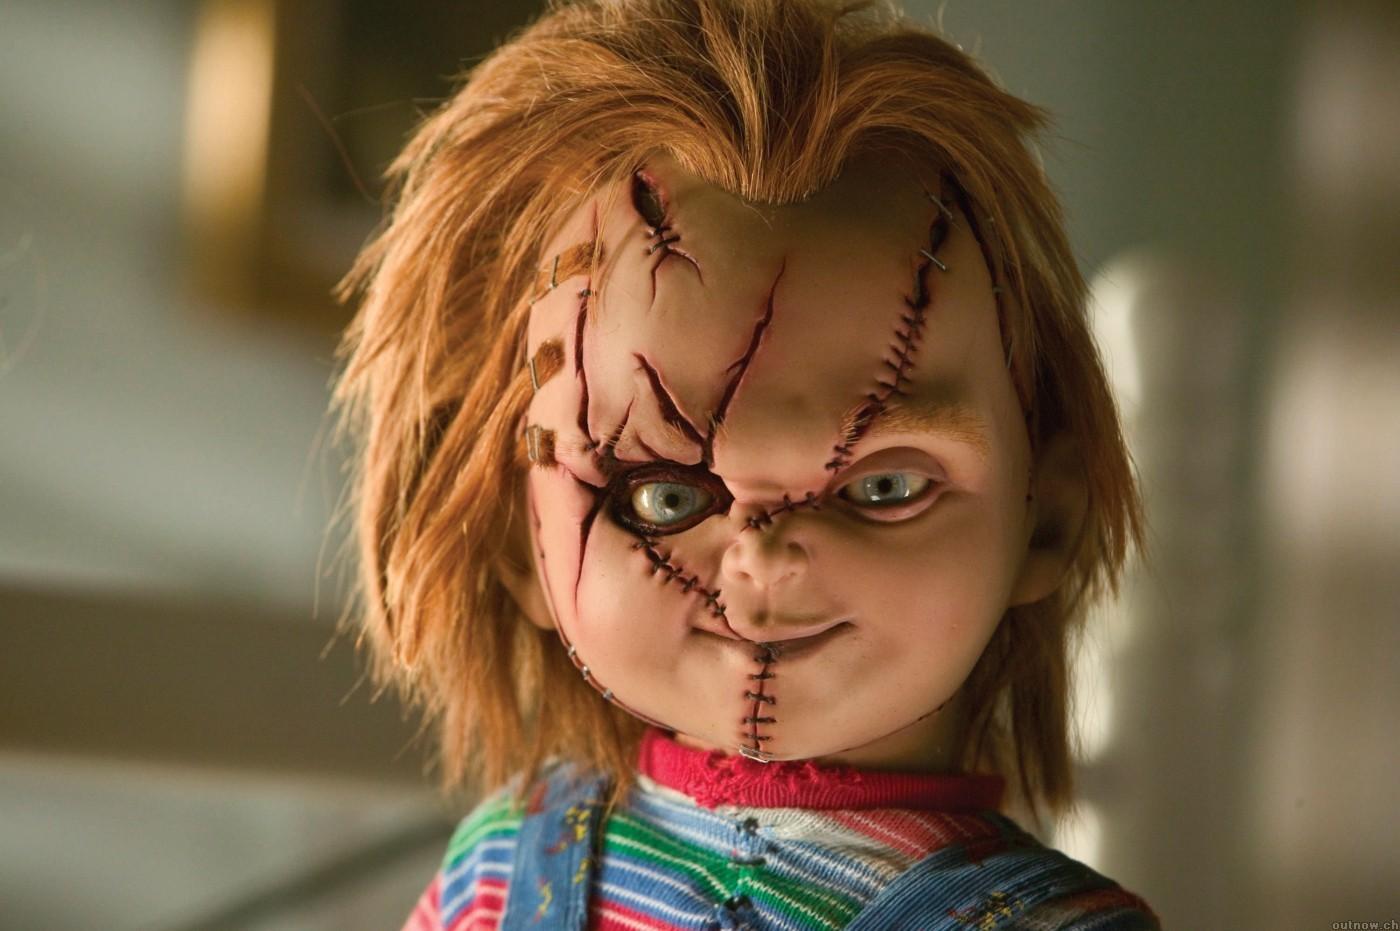 DerinKırmızı: 'Justin Bieber As Chucky